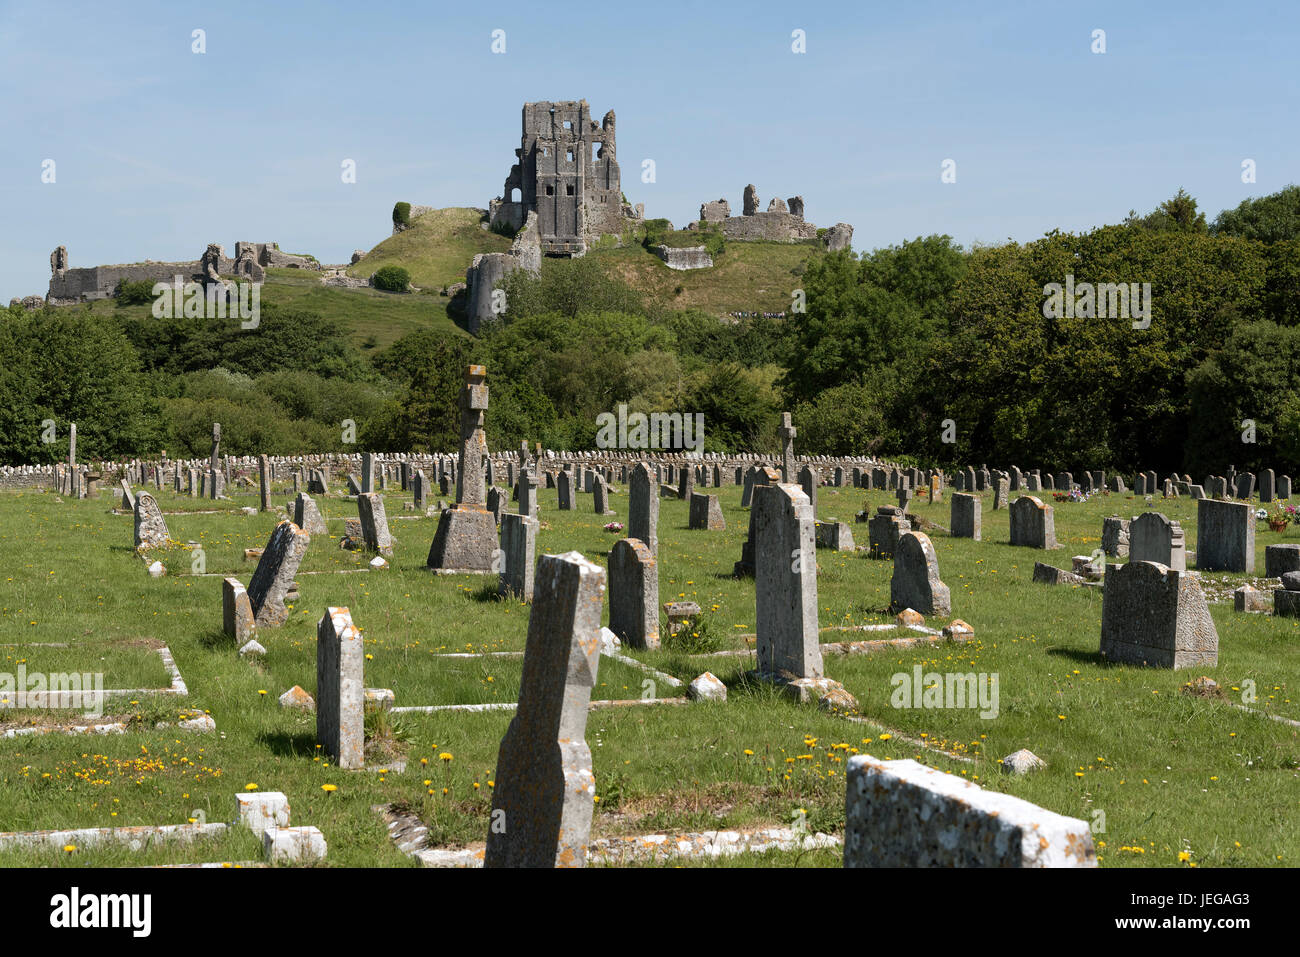 Ruined castle overlooks the cemetery at Corfe Castle Dorset England UK. June 2017 - Stock Image